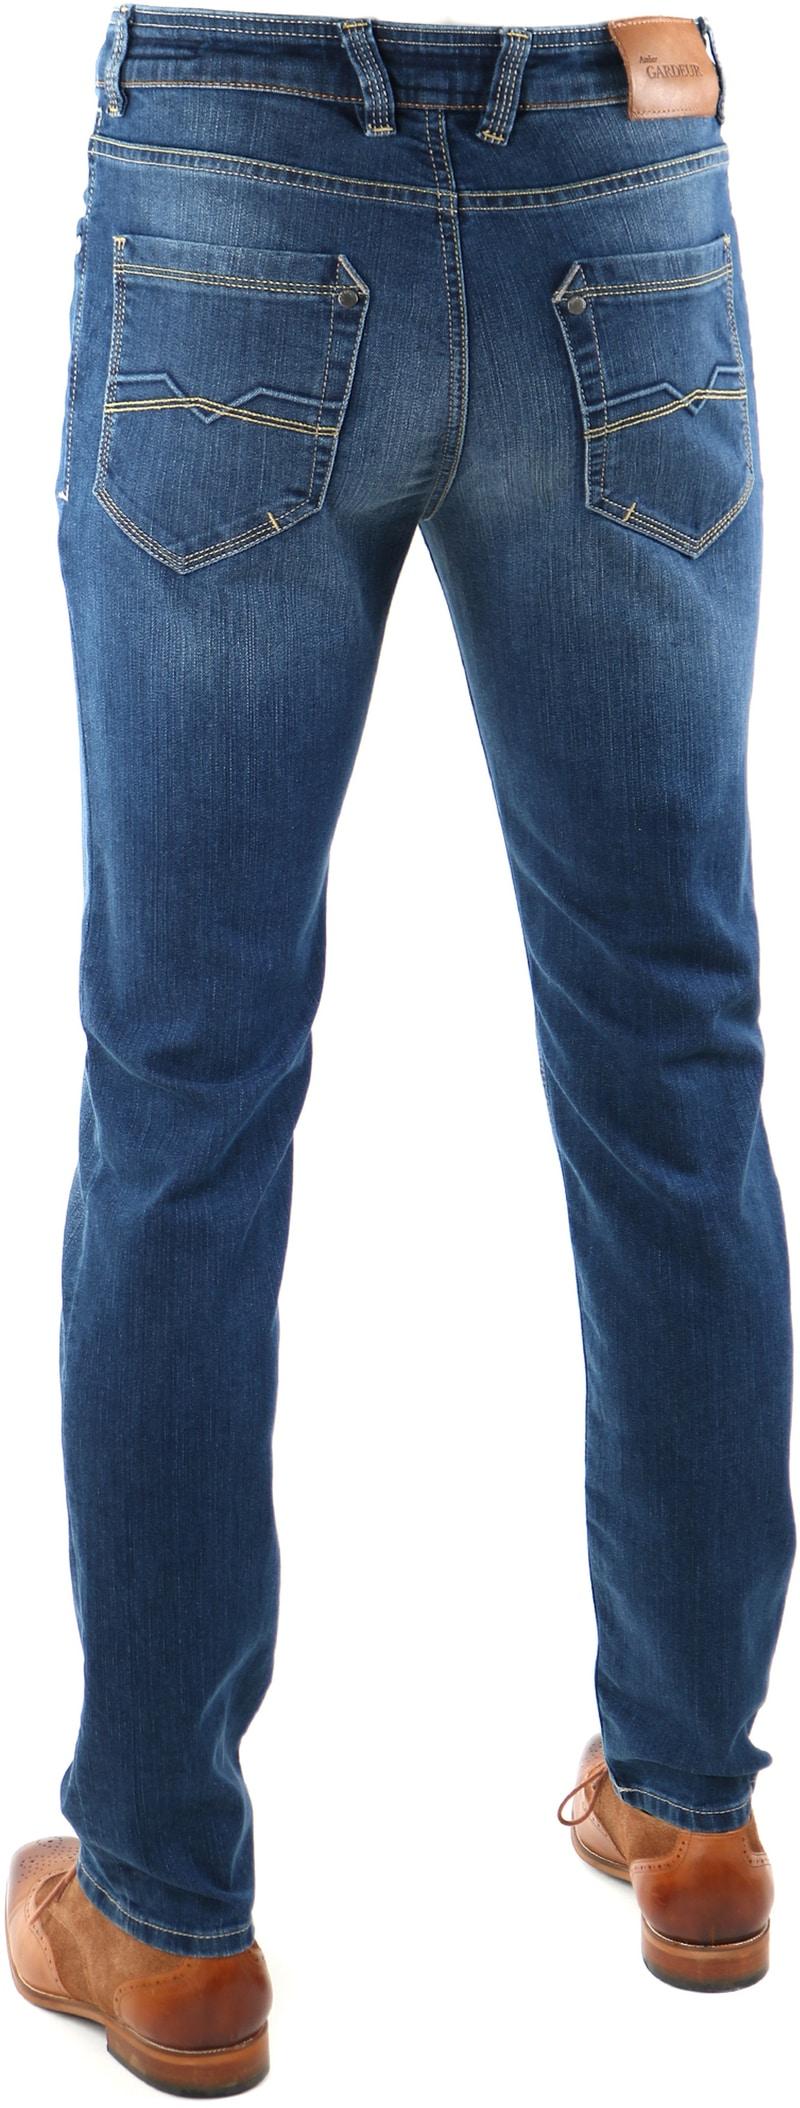 Gardeur Batu Jeans Modern-Fit Blau Foto 3